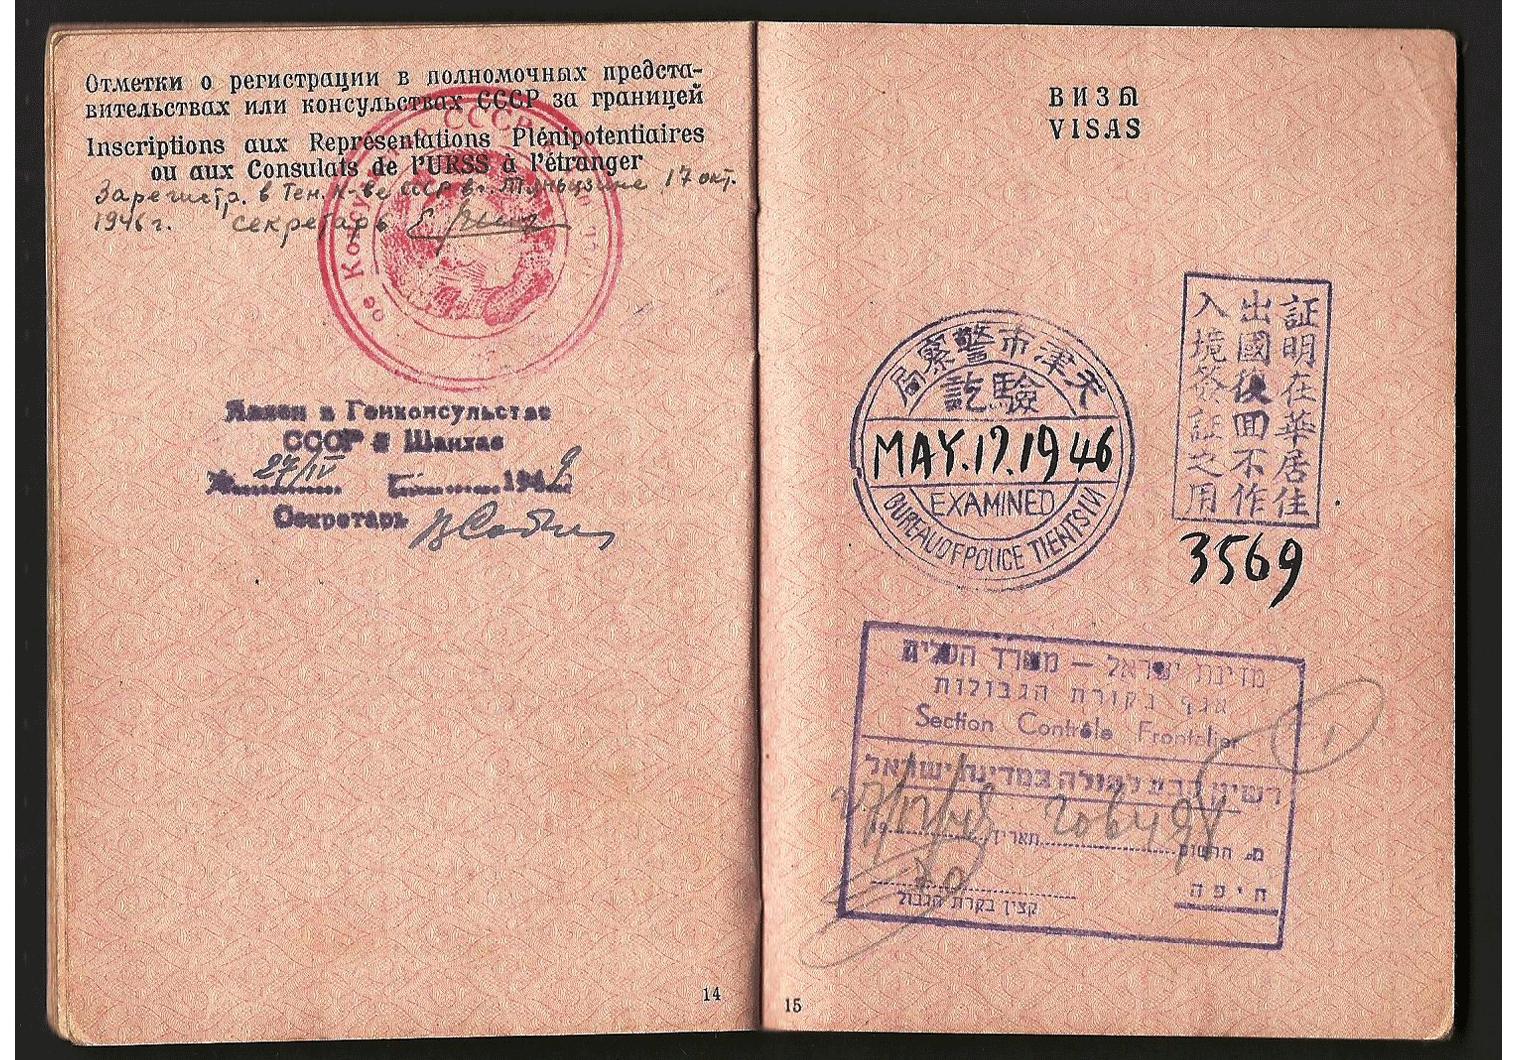 WW2 USSR passport